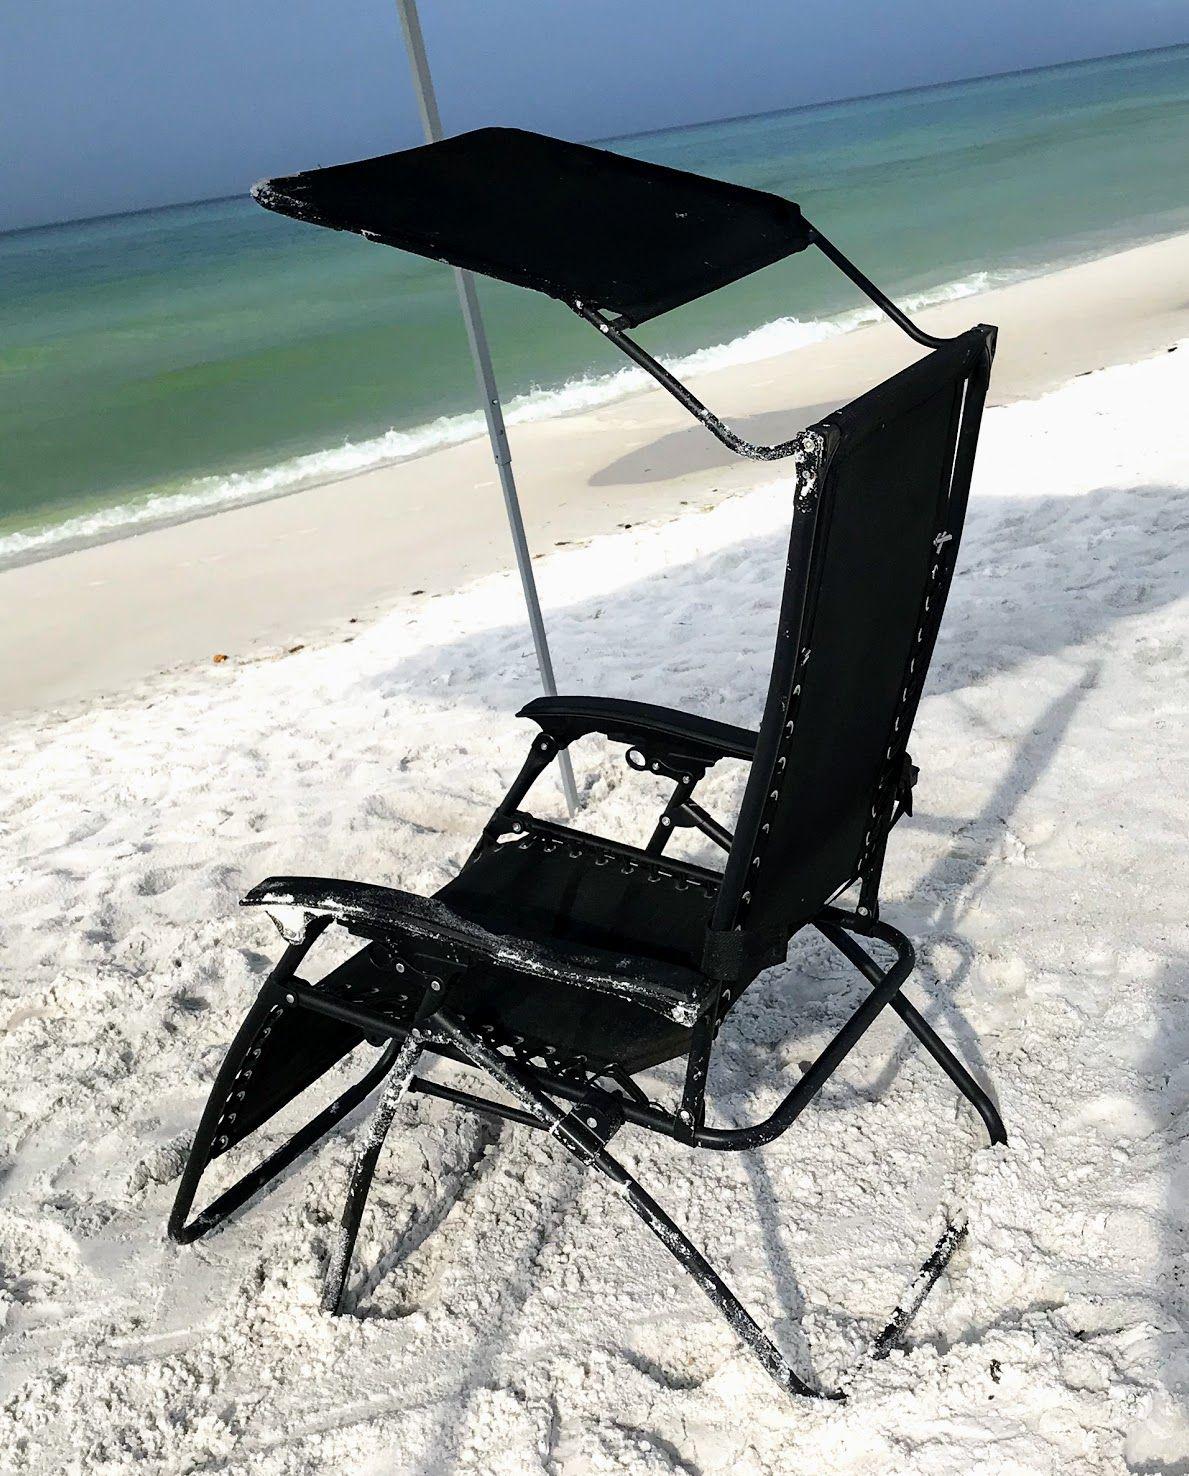 Zero Gravity Lounge Chair With Canopy Beach Lounge Chair Beach Lounge Cool Umbrellas